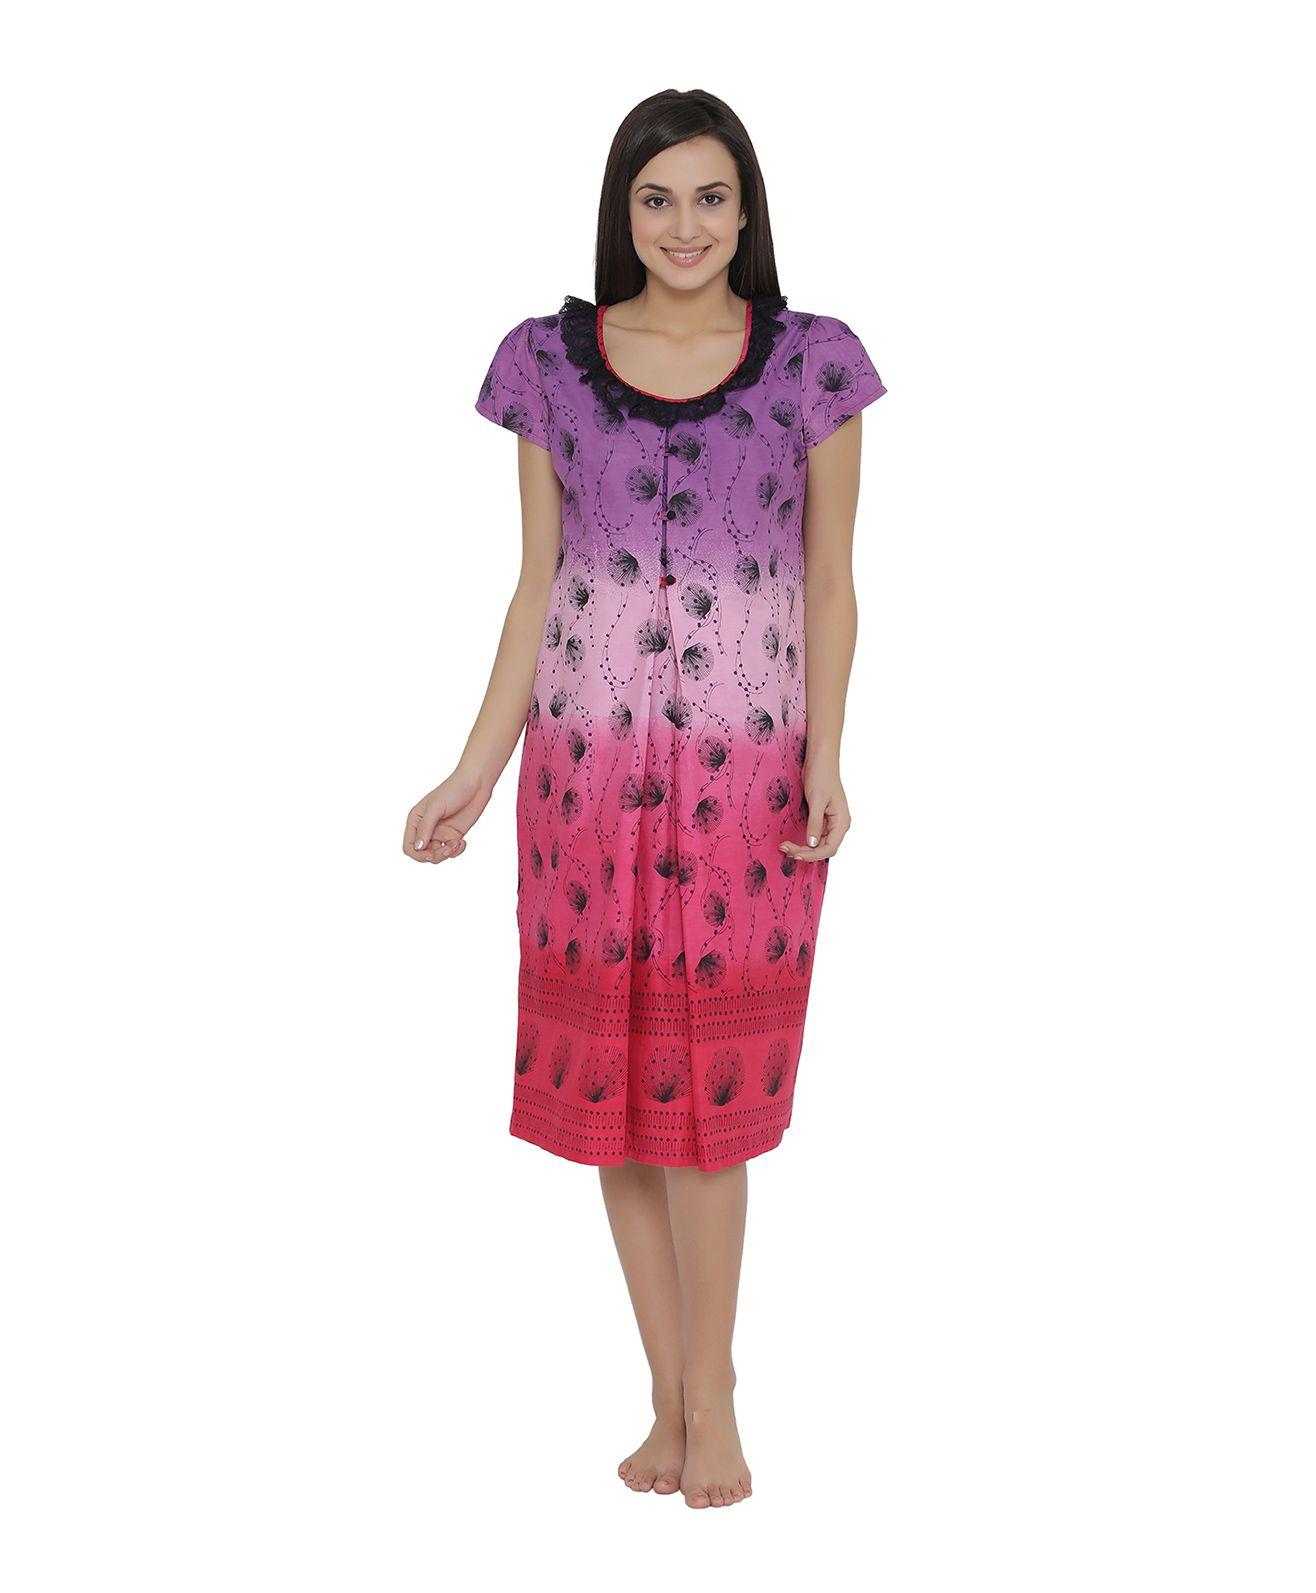 d9f52bb29e211 Clovia Short Sleeves Maternity Nursing Nighty Floral Print Purple ...